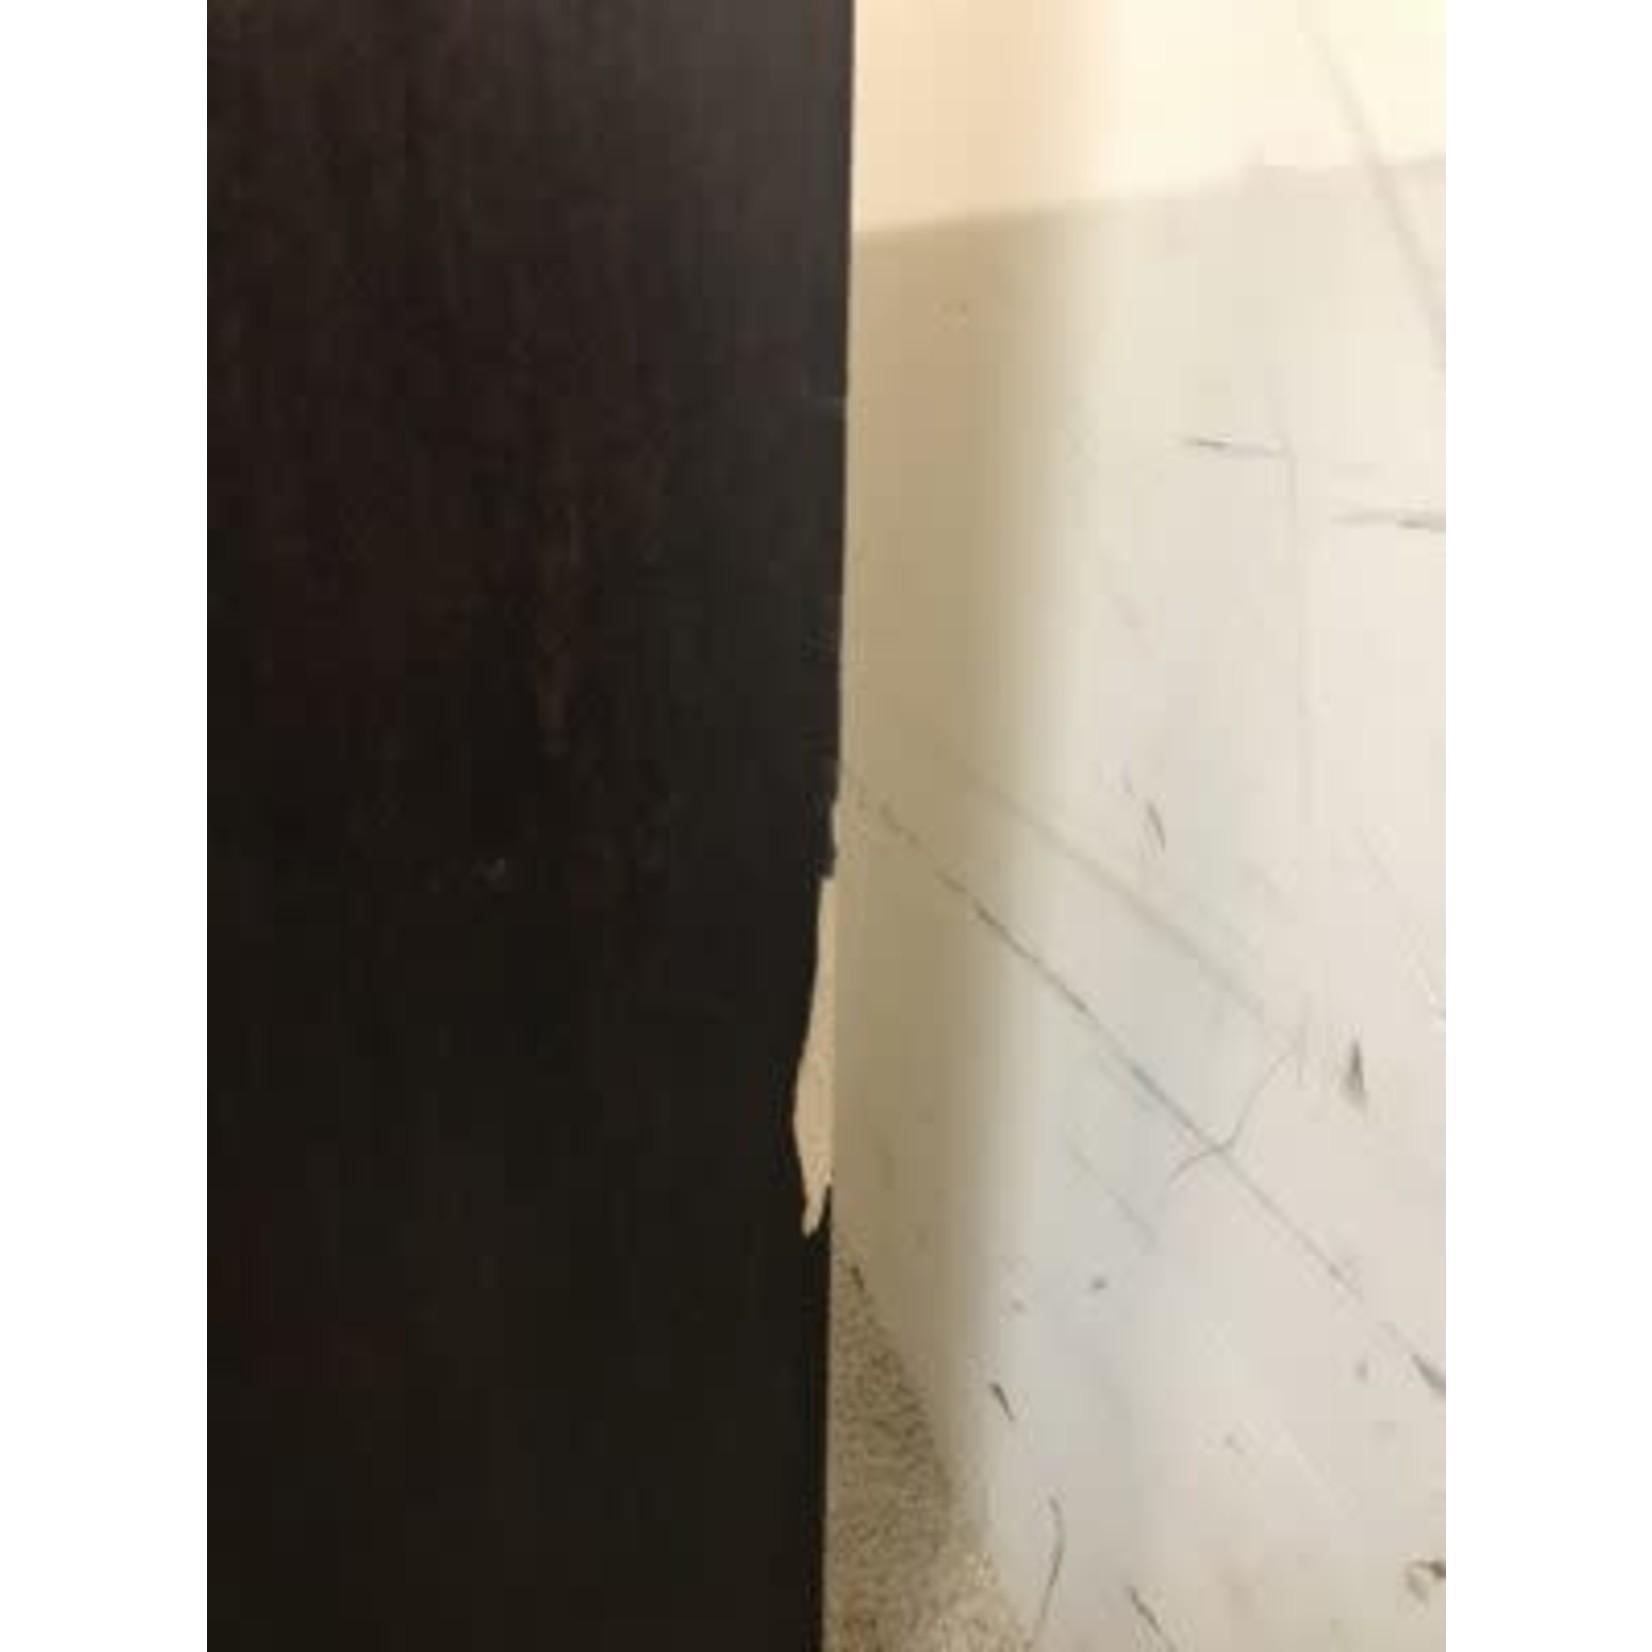 8311 Kraftmaid 1 Drawer and 1 Door Base Cabinet